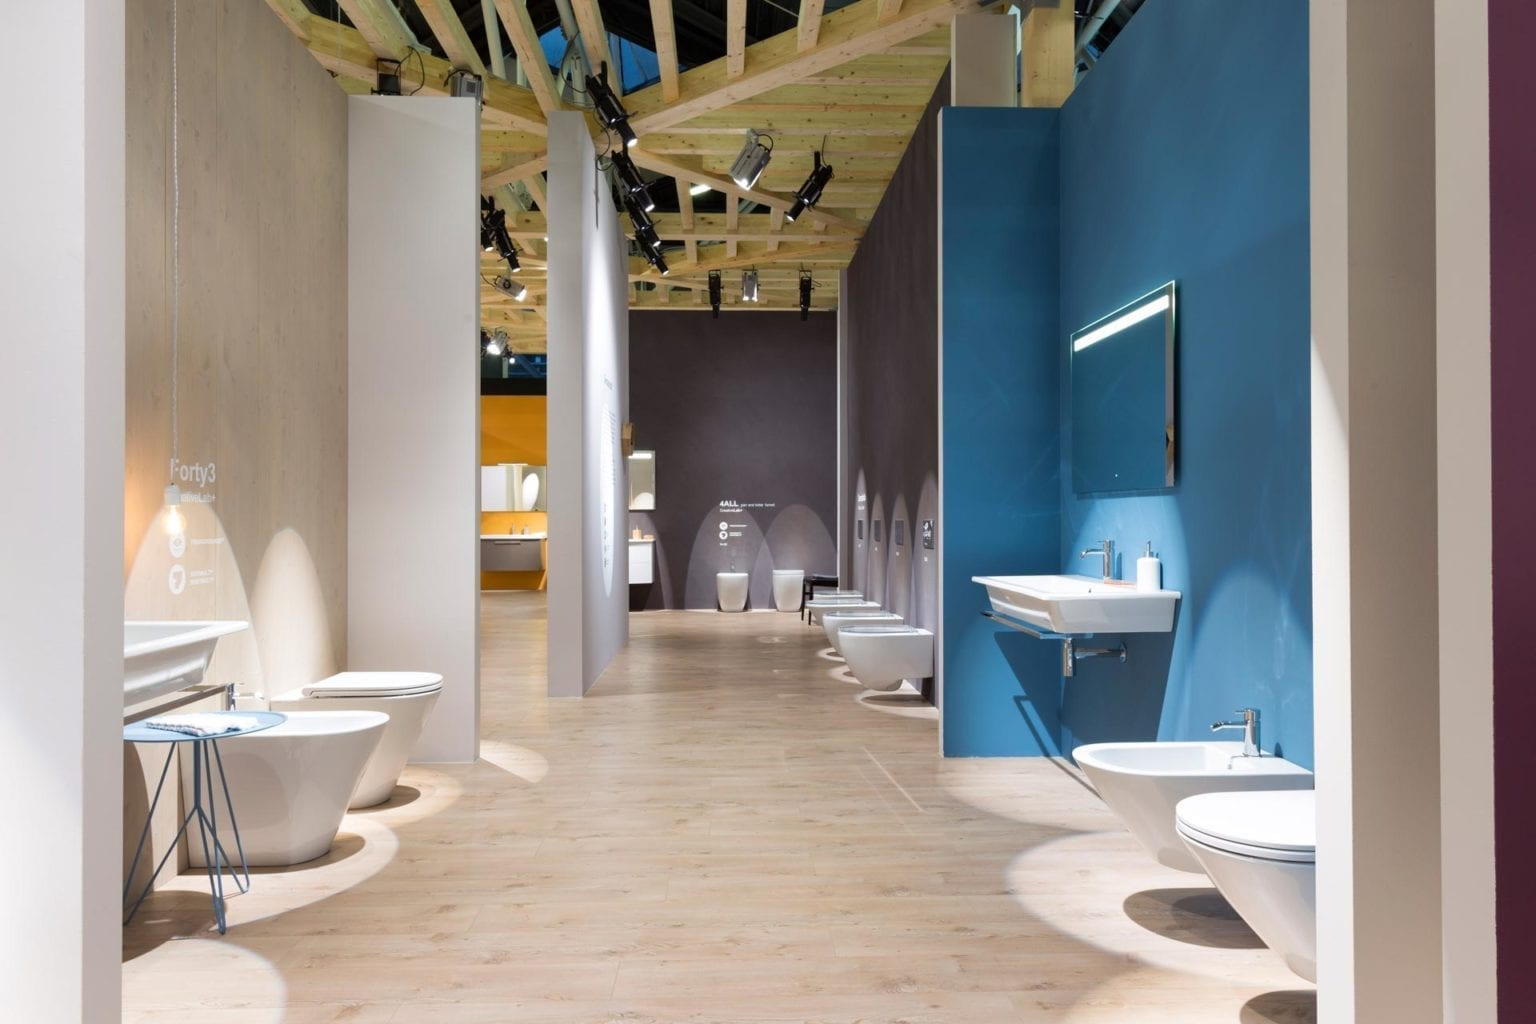 Globo Cersaie 2015 exhibition interior design 04